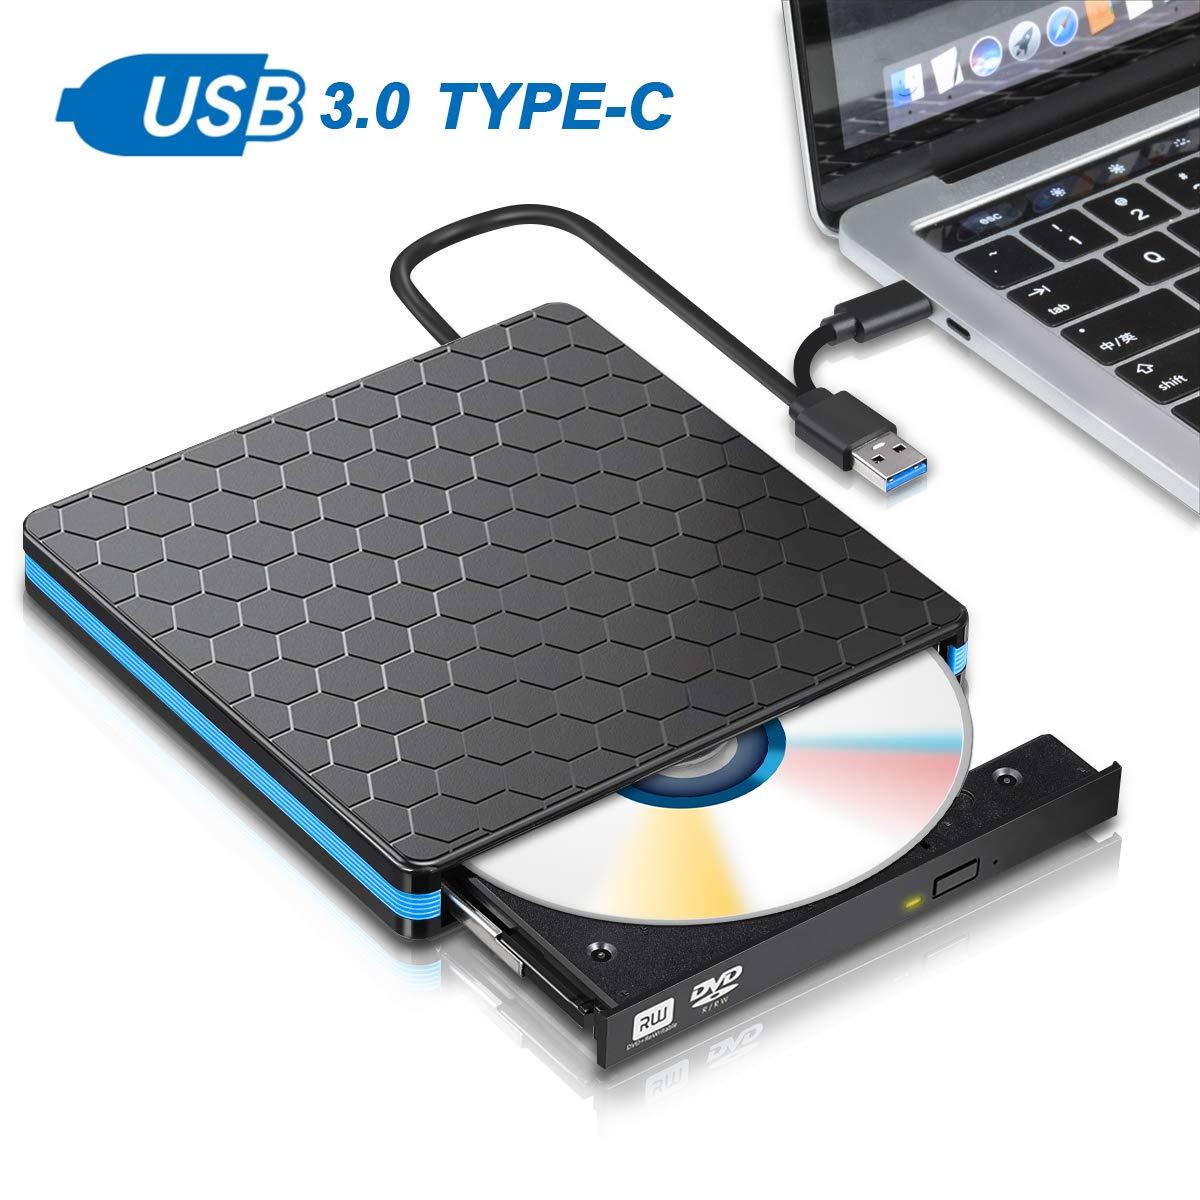 M Way Dual Port External DVD Burner AMAZON $14.99 free ship with prime